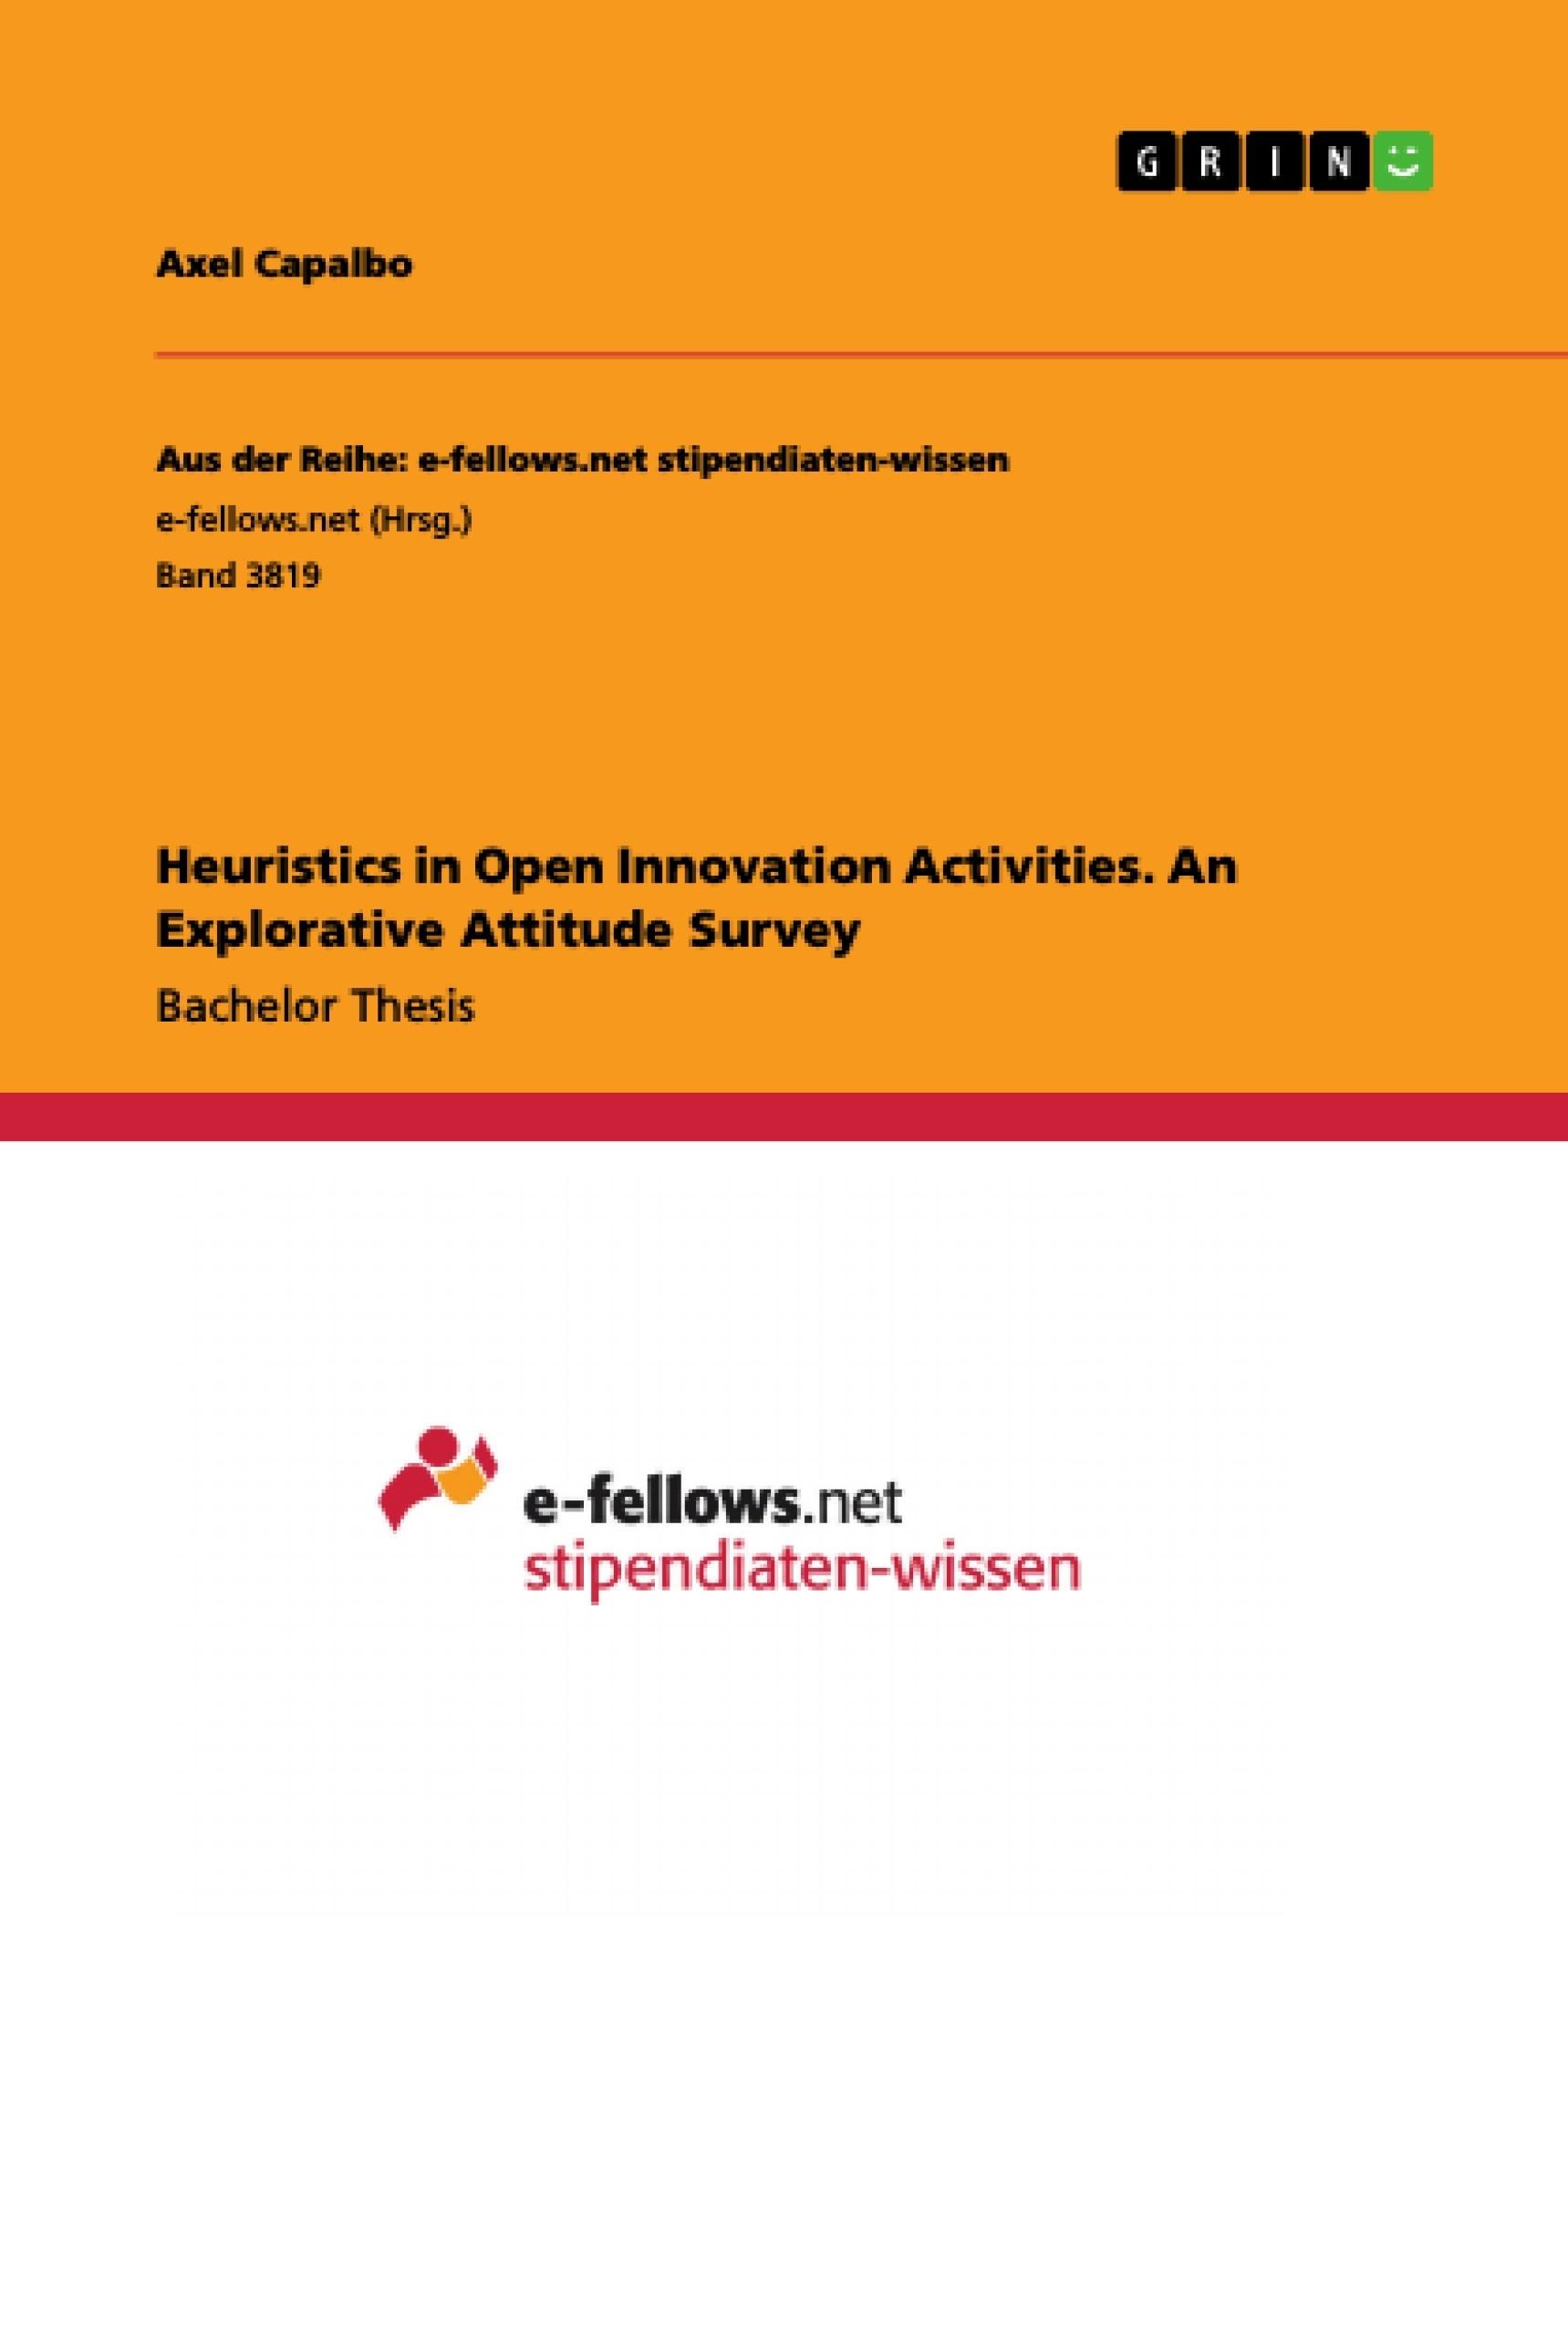 Title: Heuristics in Open Innovation Activities. An Explorative Attitude Survey